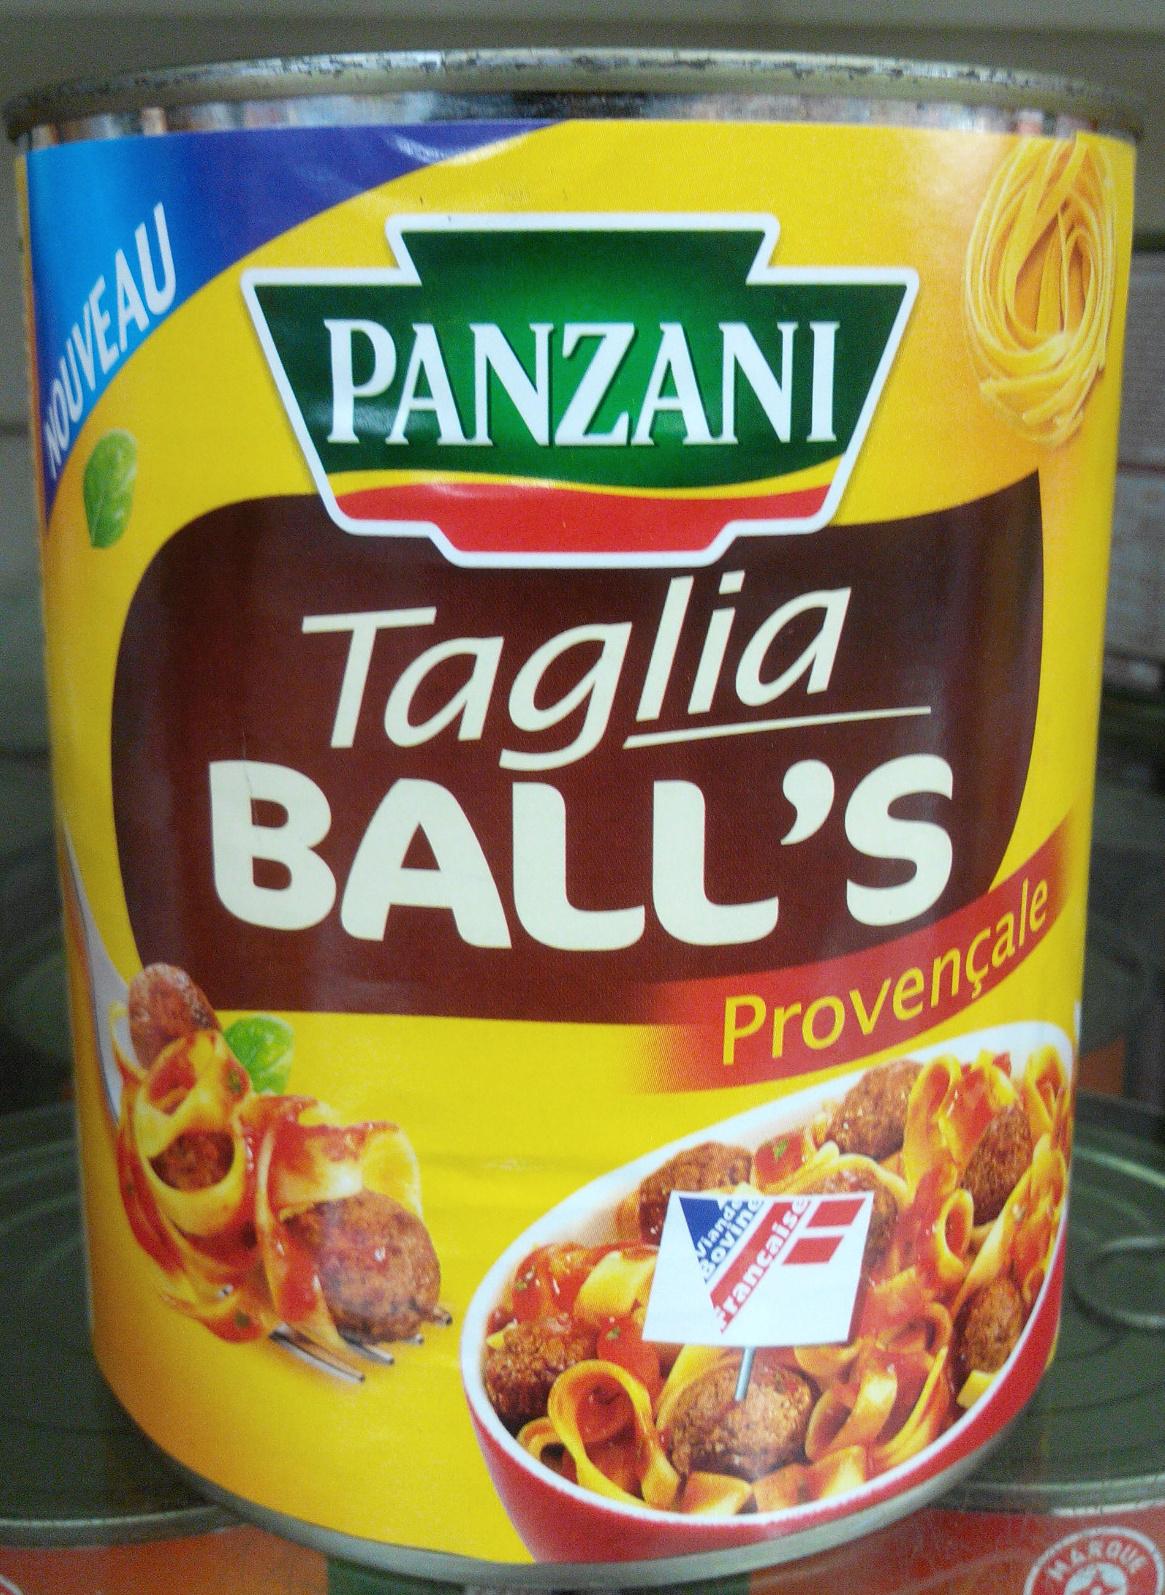 Taglia Ball's Provençale - Product - fr